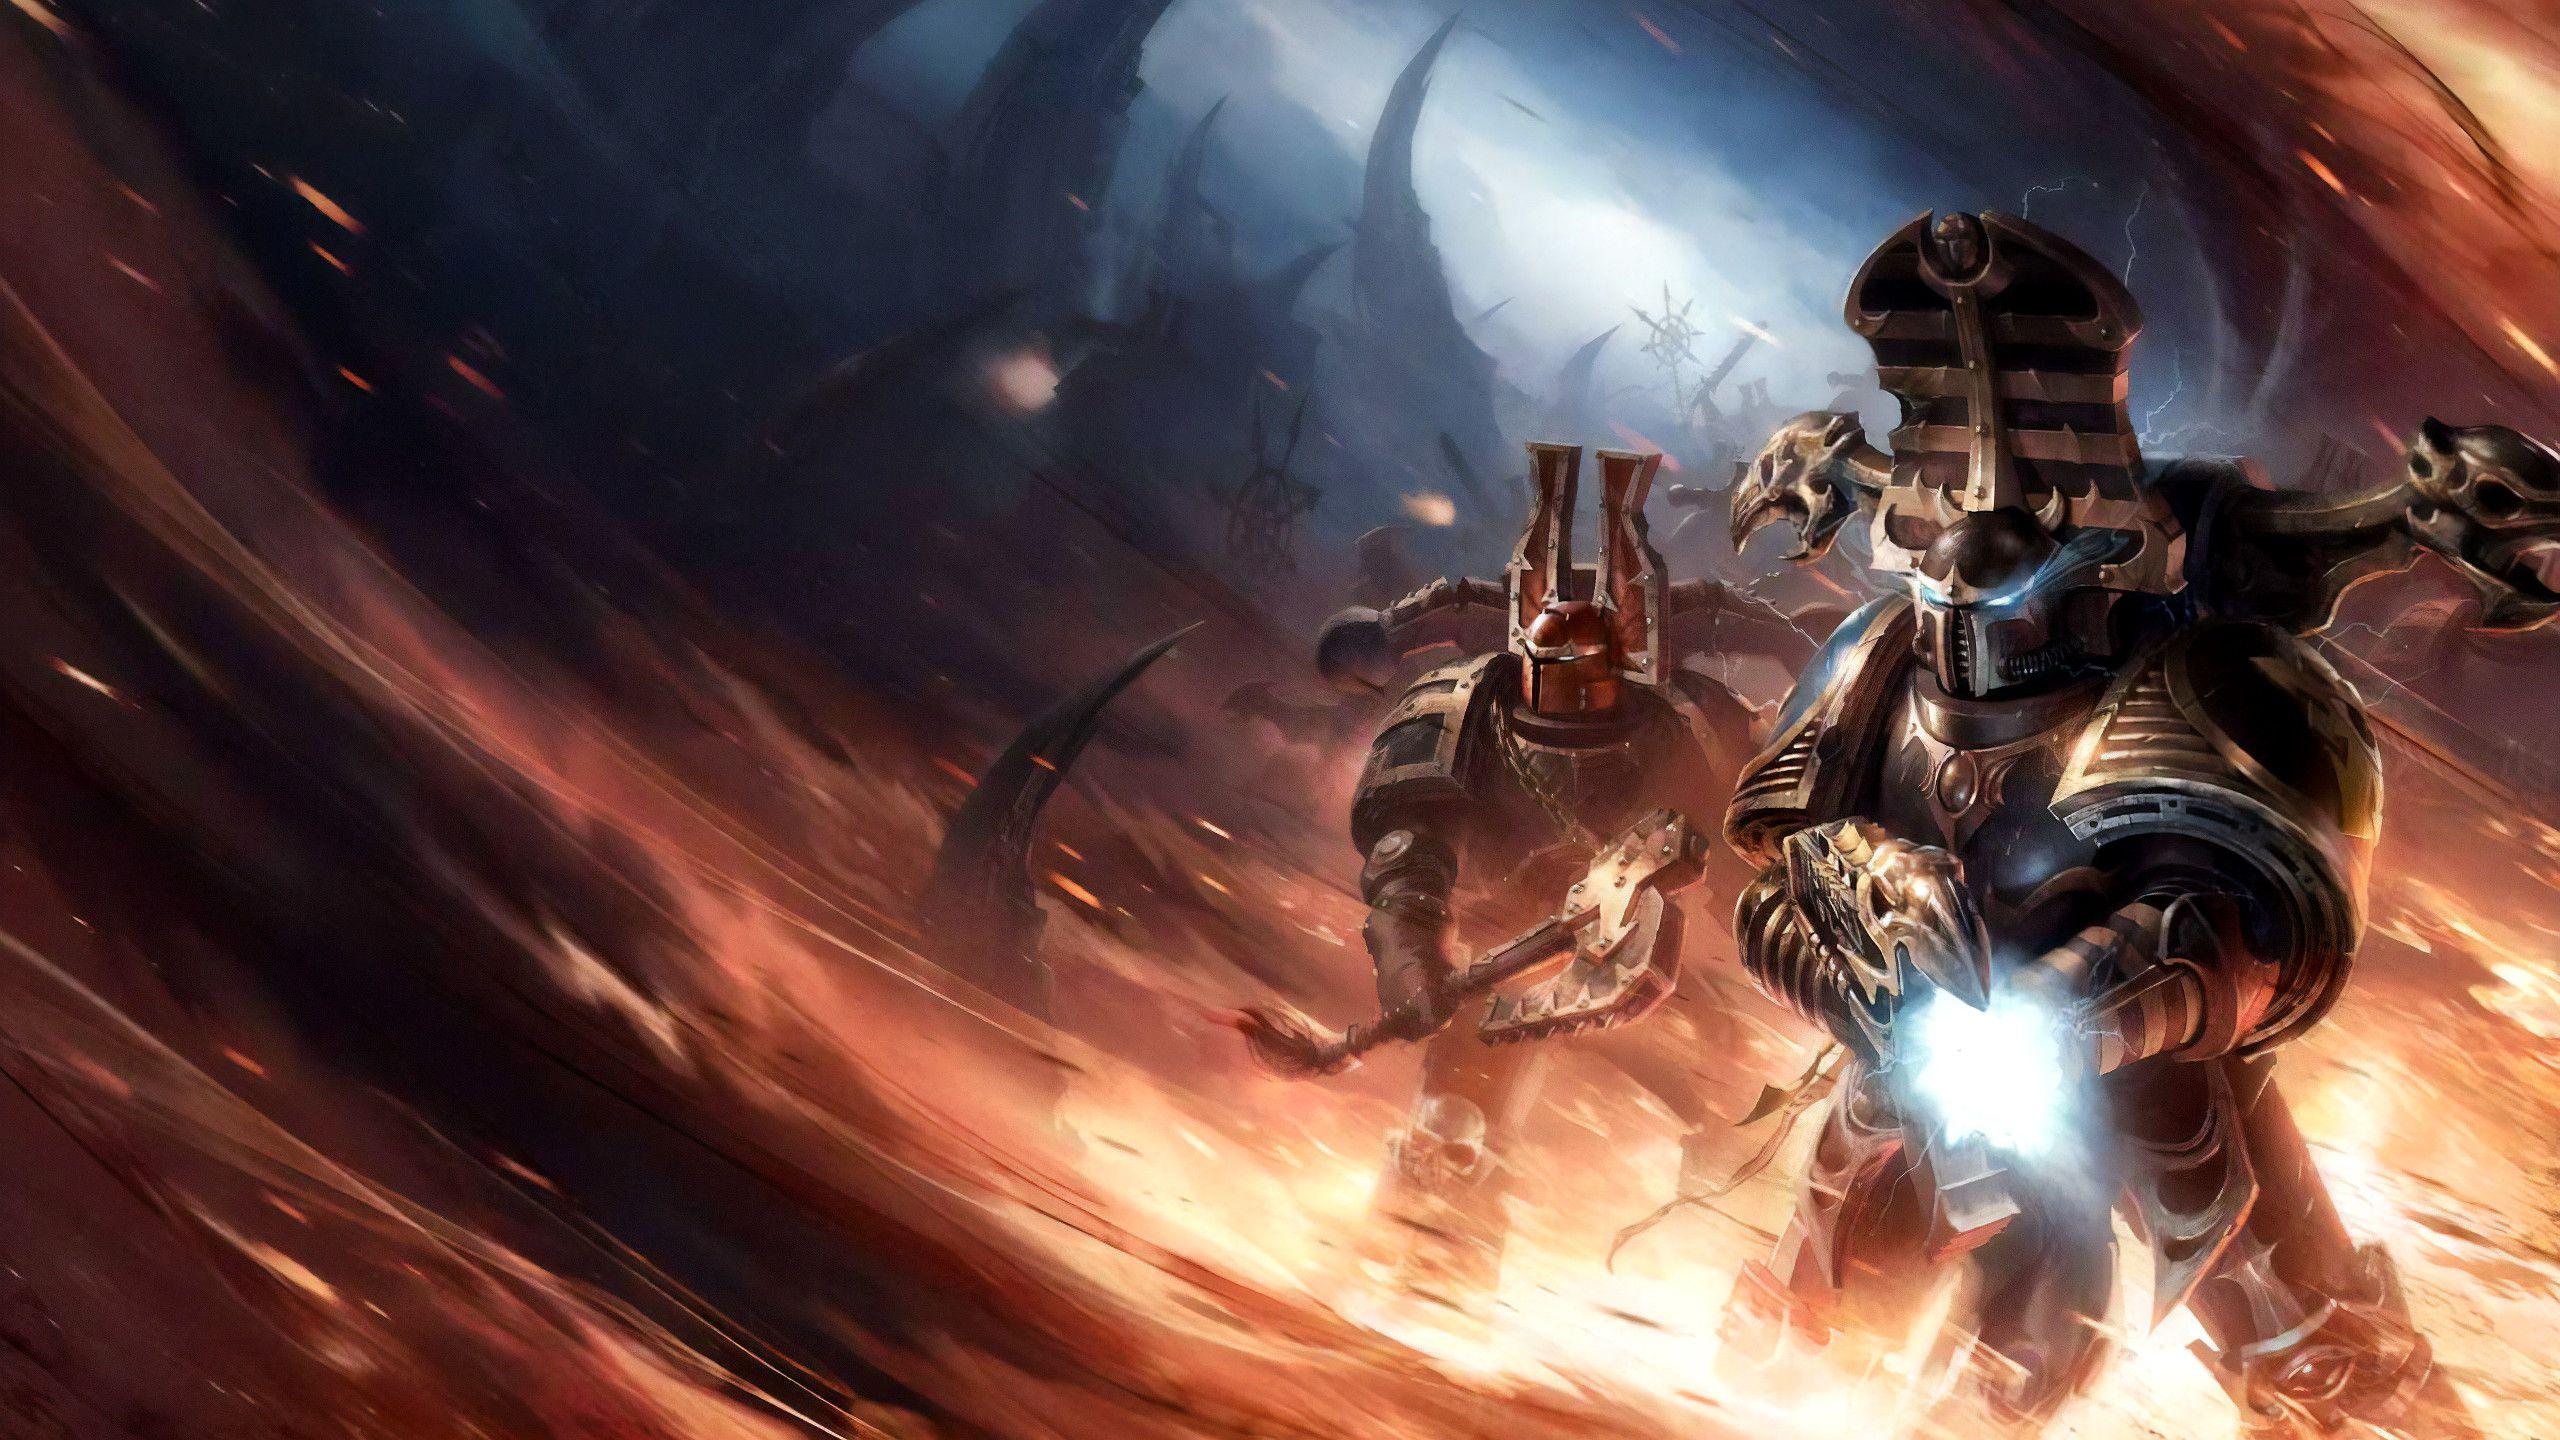 Pin By Lars Keen On Heretical Astartes Warhammer Art Dark